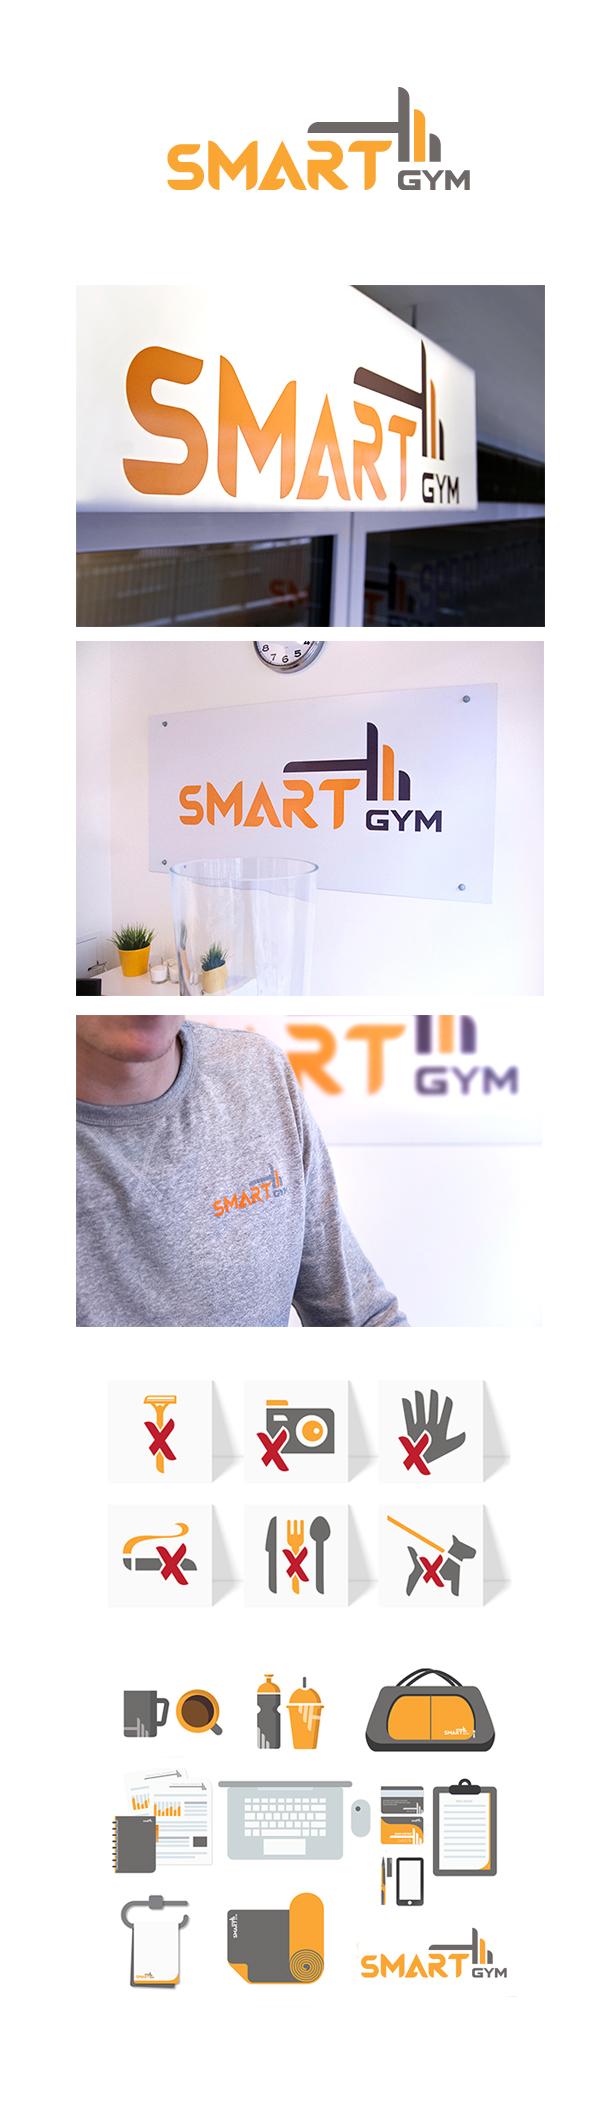 smartgym